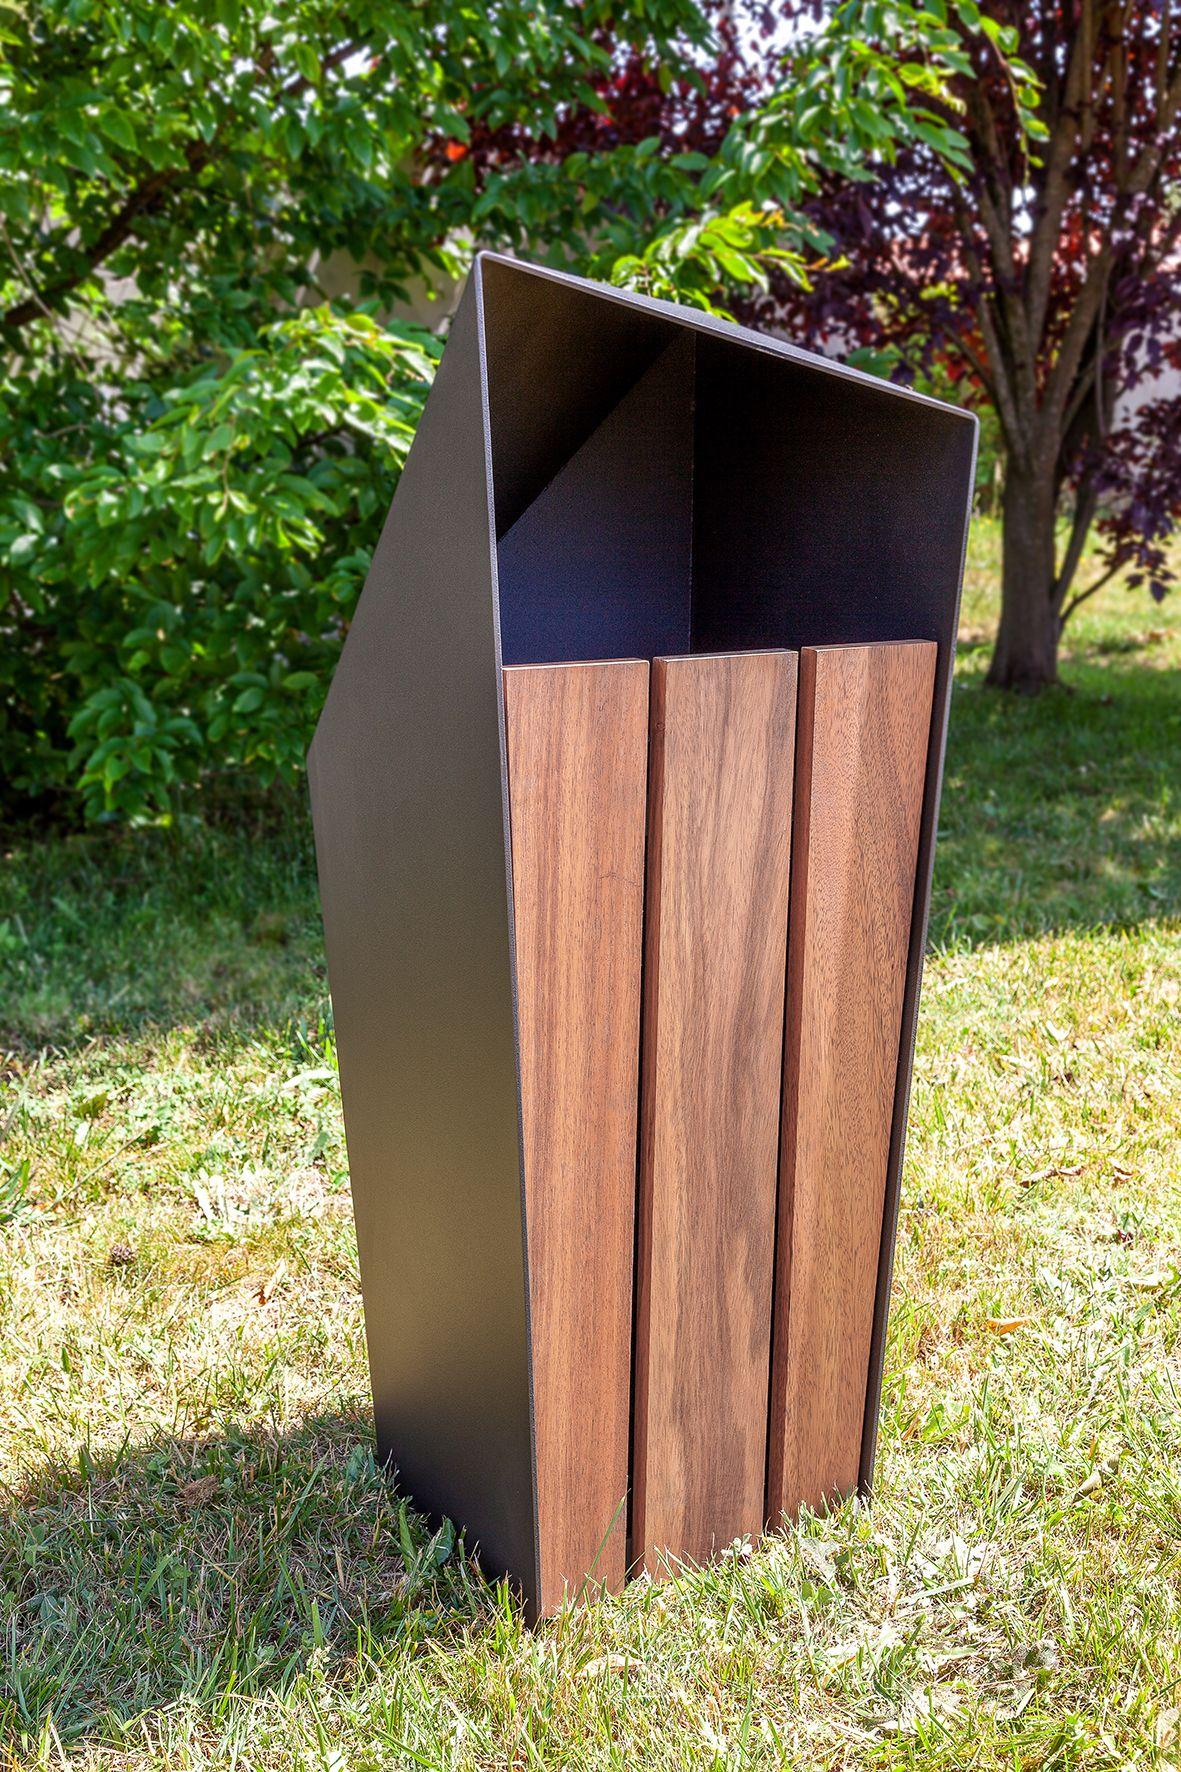 Skew Waste Bin Collection Sit Design Bio Sousa